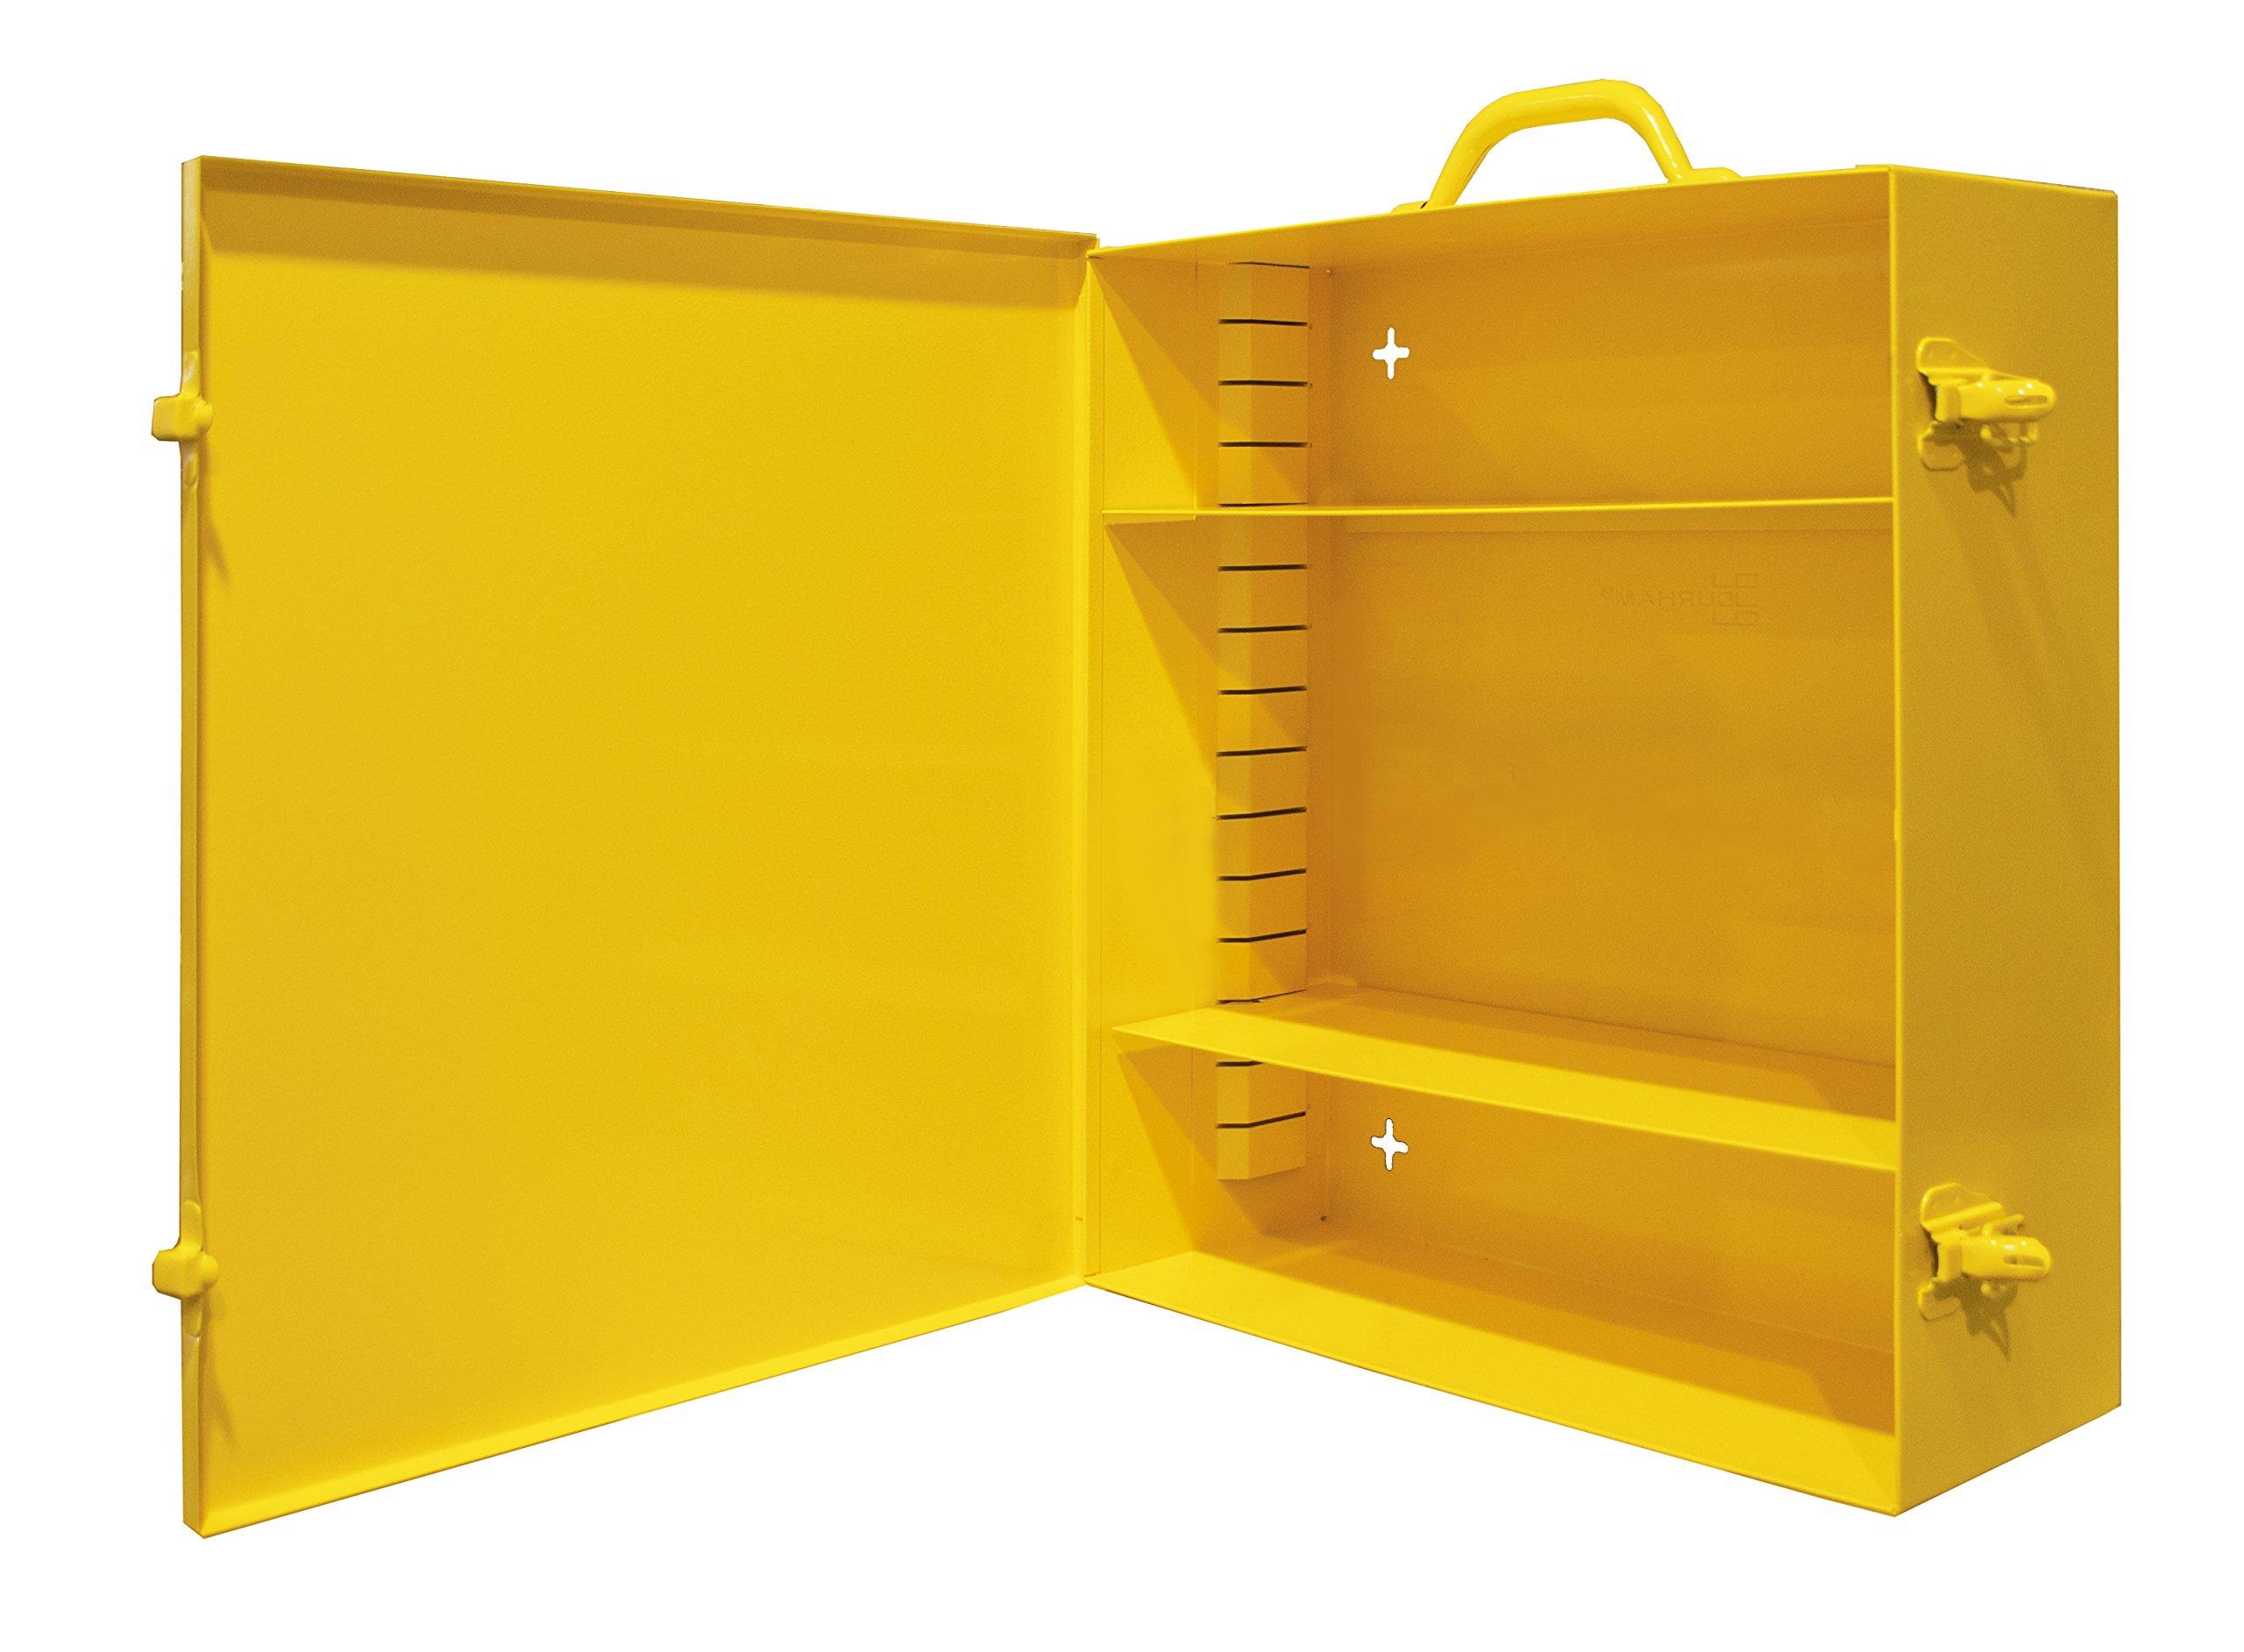 Durham 534AV-50 Wall Mount Spill Control Box